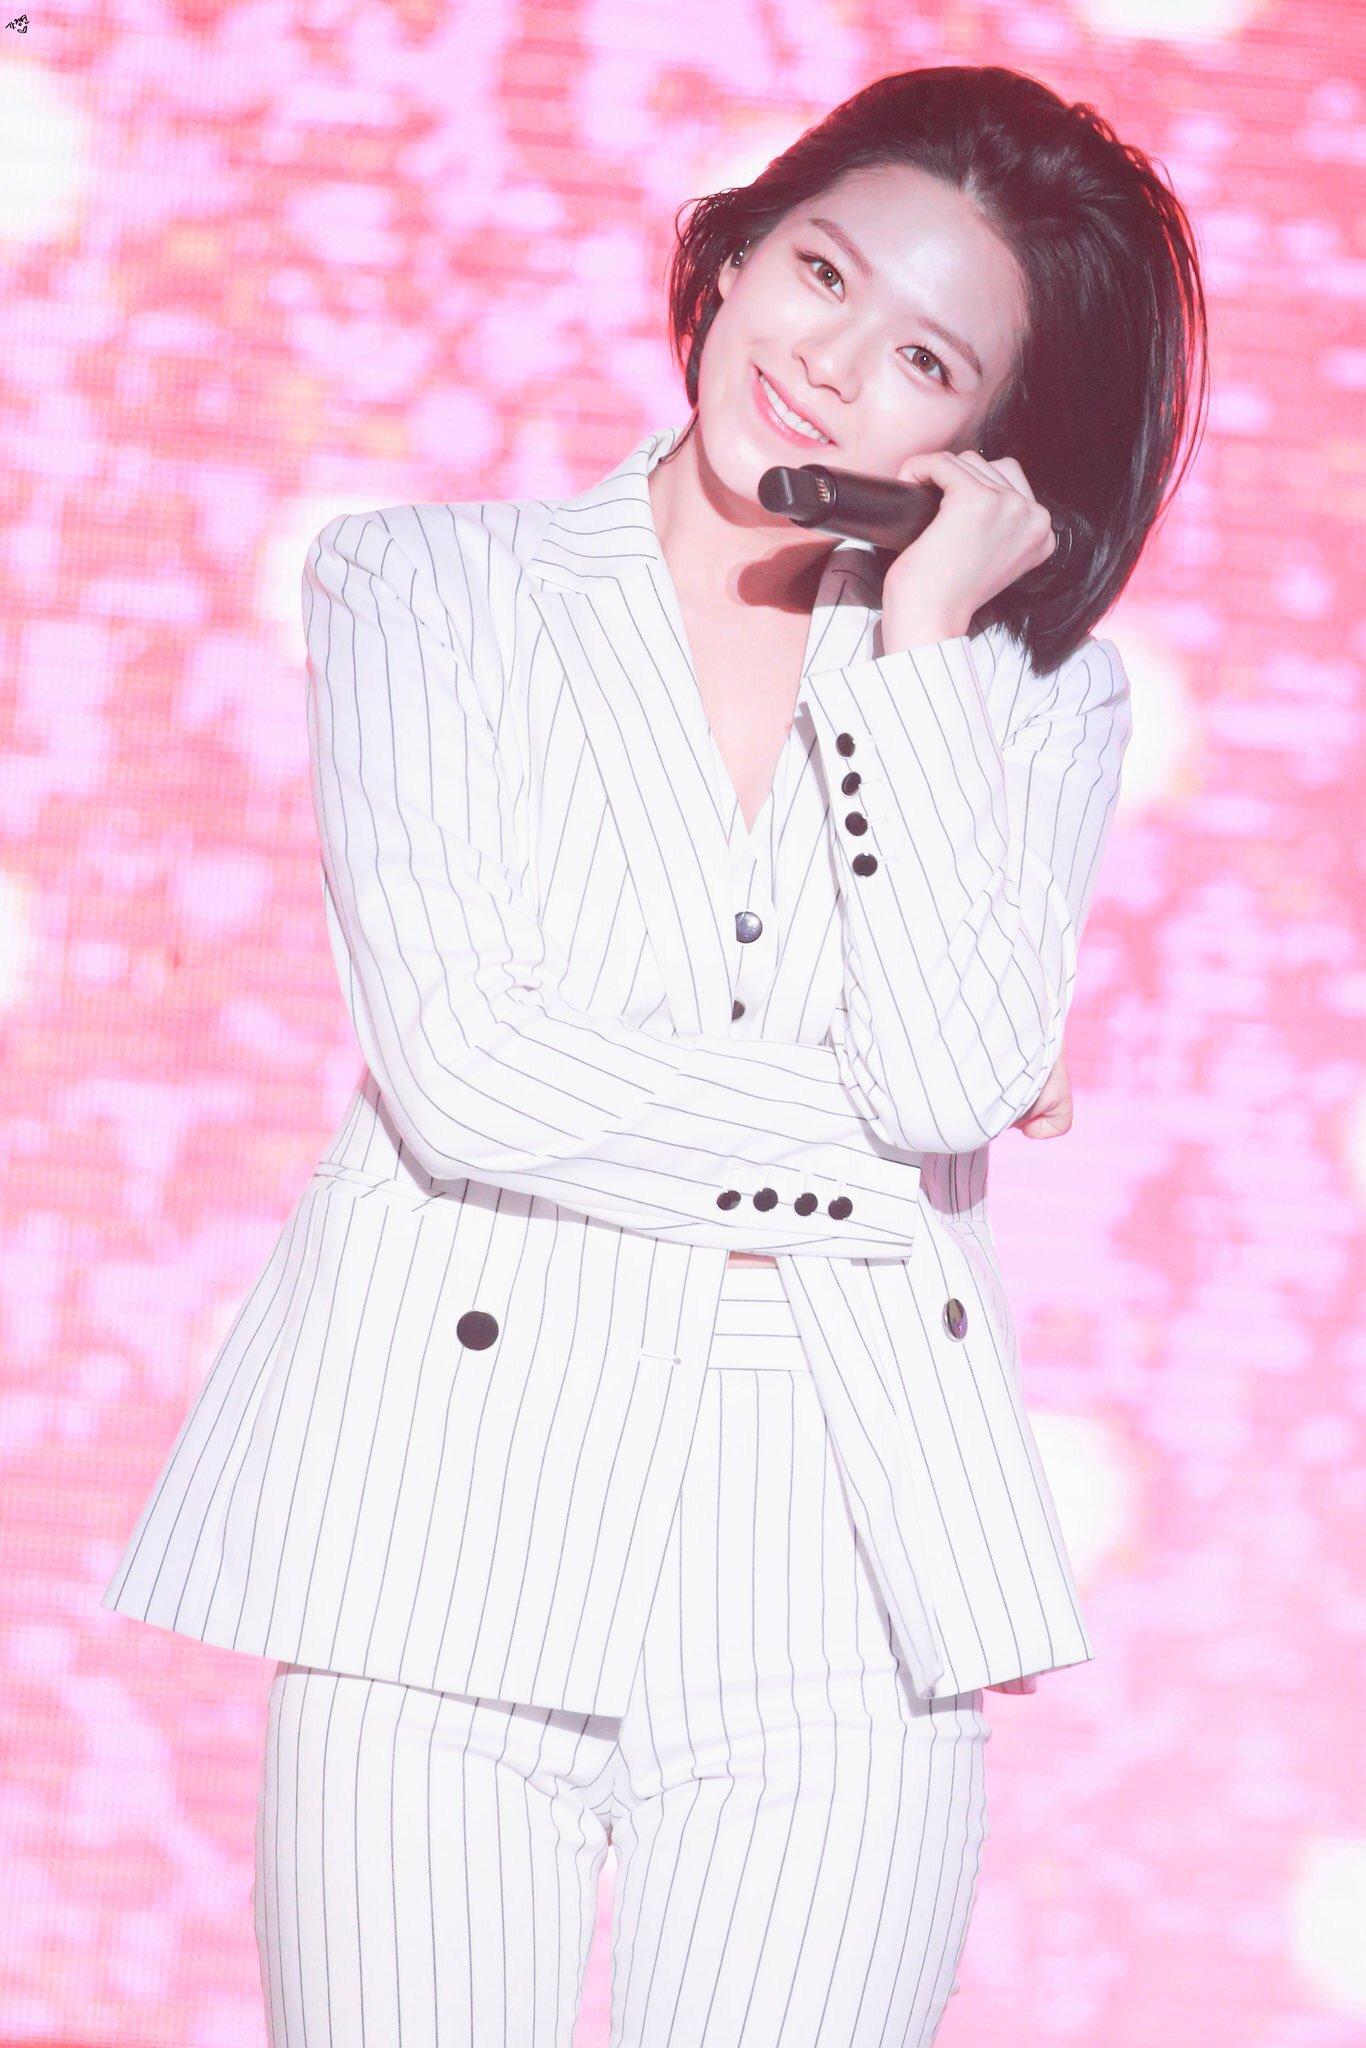 jeongyeon_lotte family concert_6